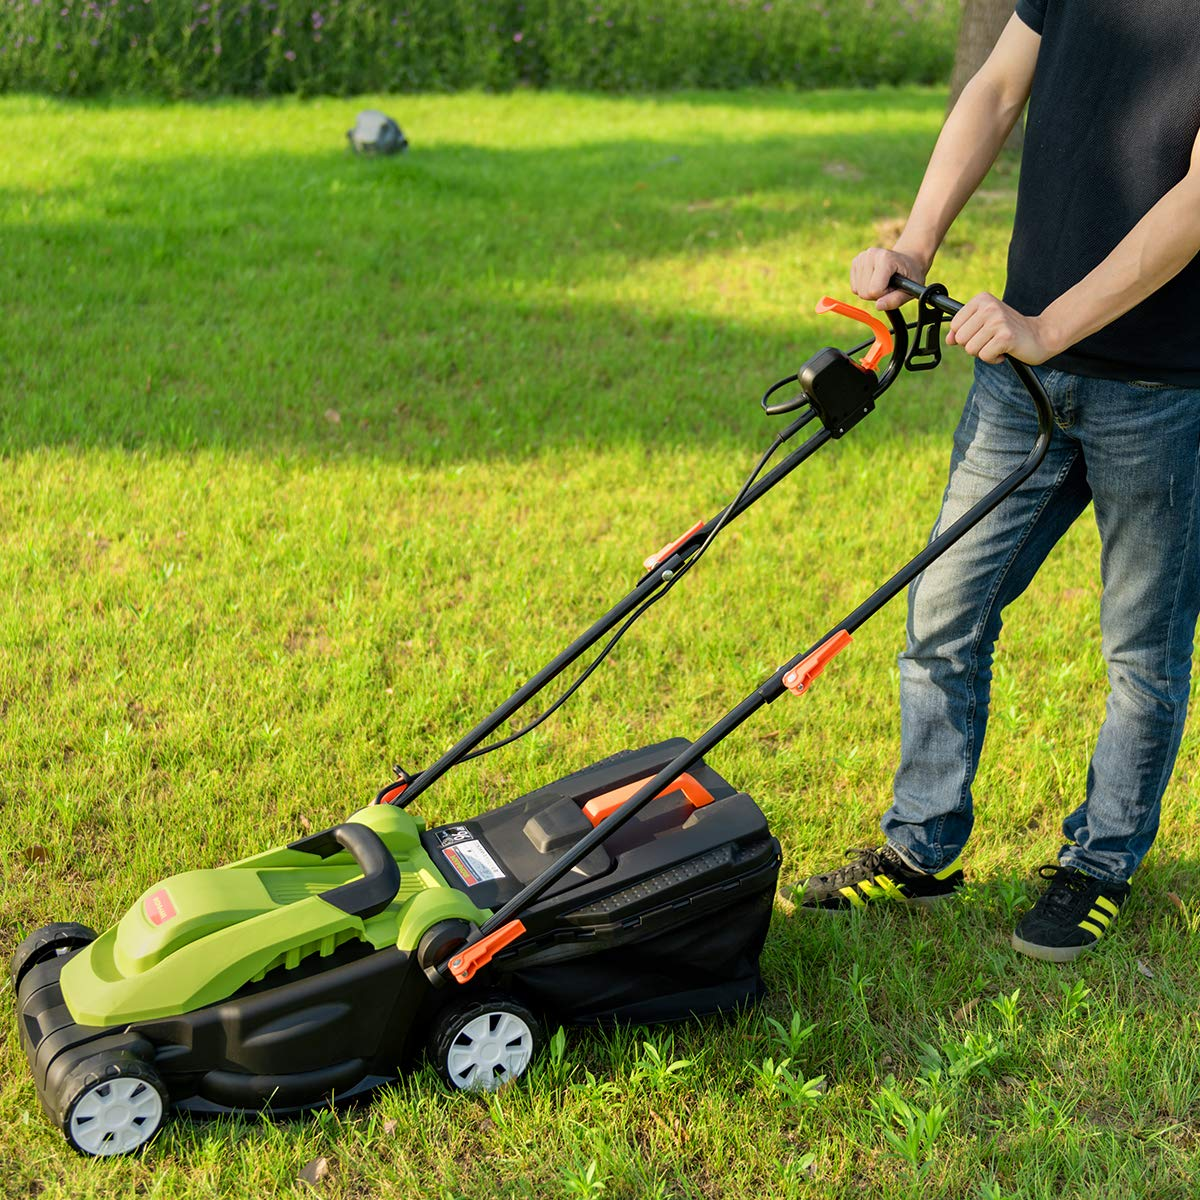 Goplus Electric Lawn Mower w/Folding Handle and Detachable ...